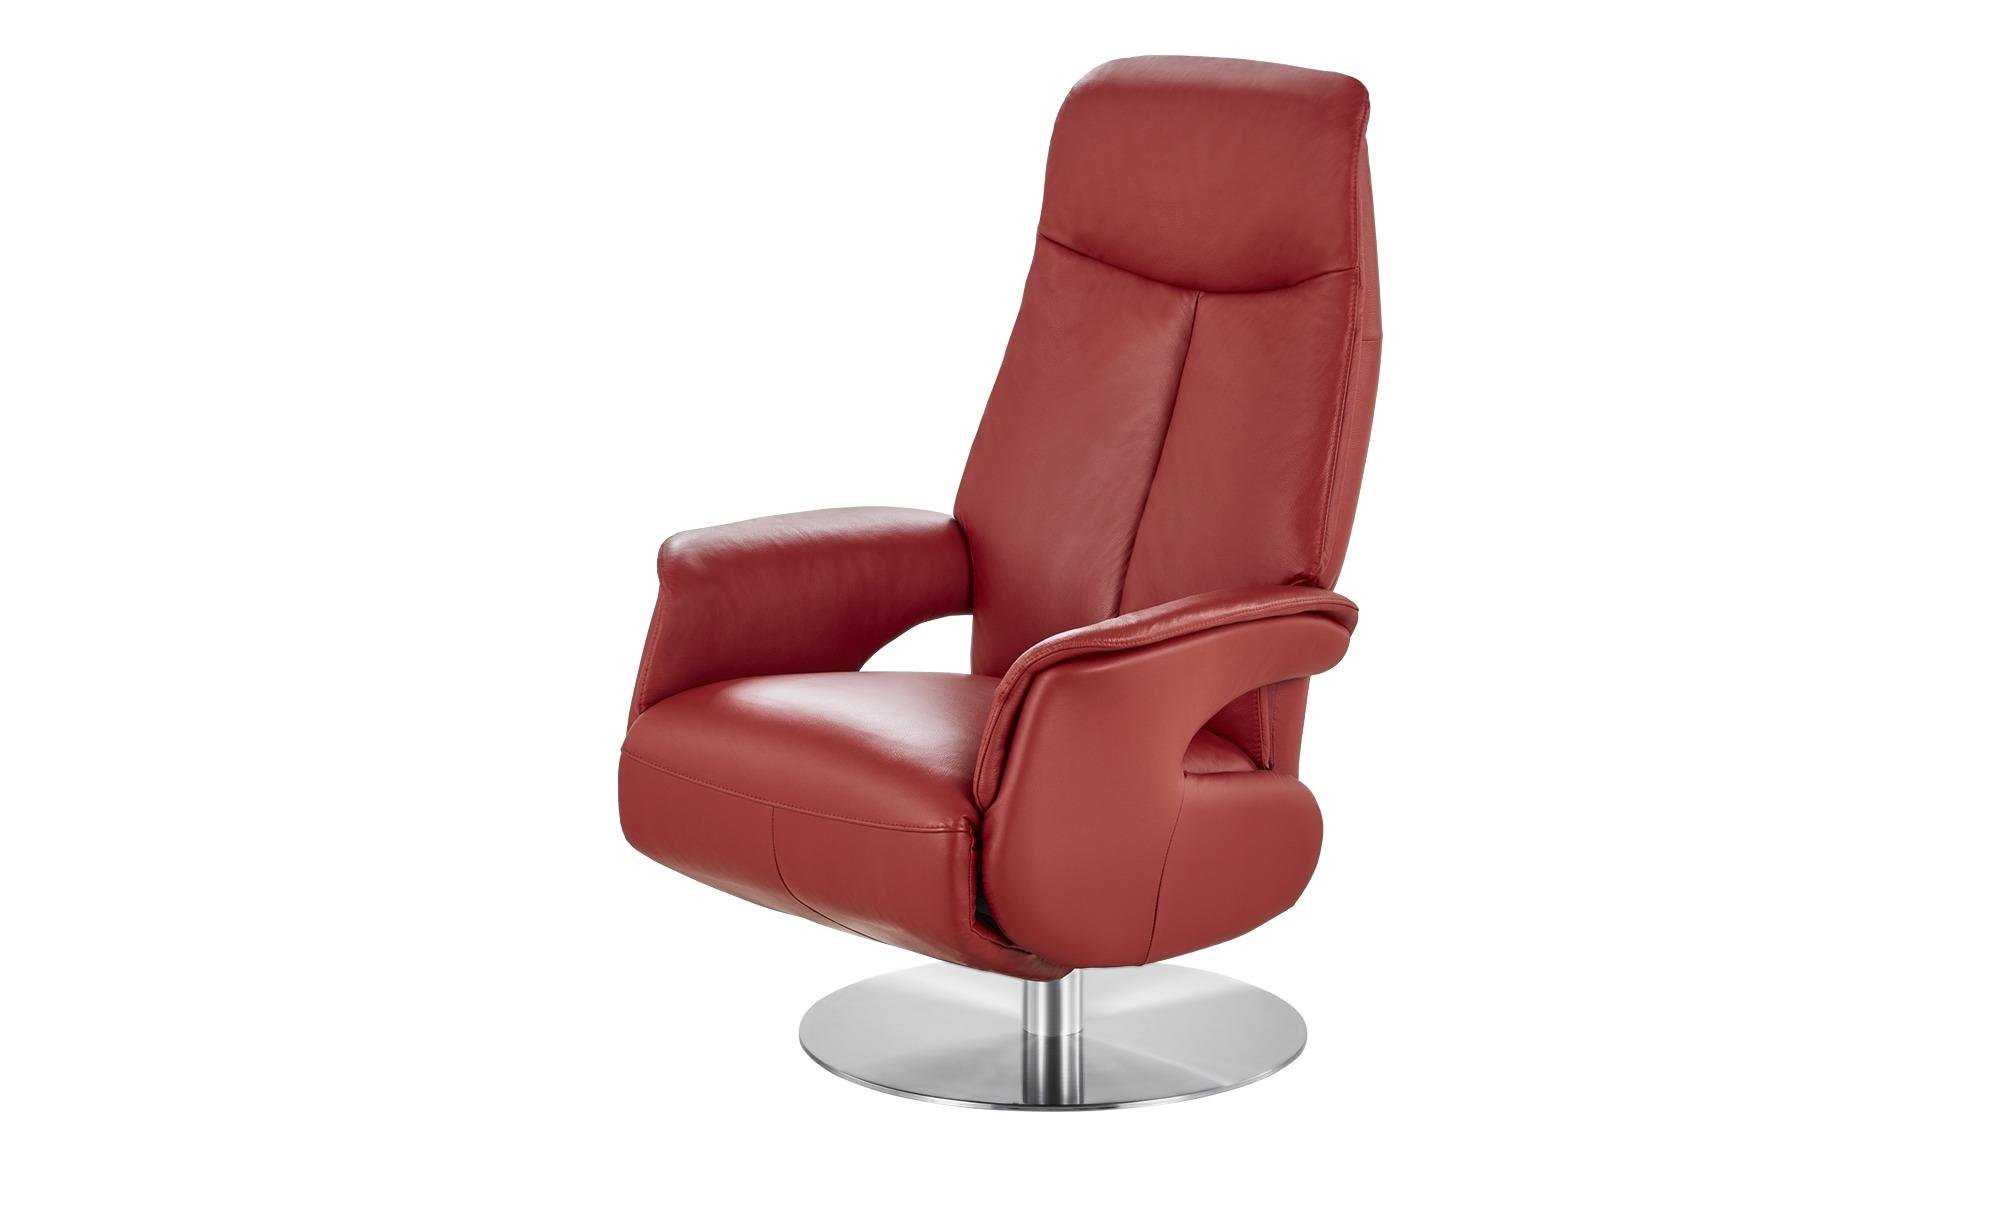 Relaxsessel Leder Rot Bei M Bel Kraft Online Kaufen